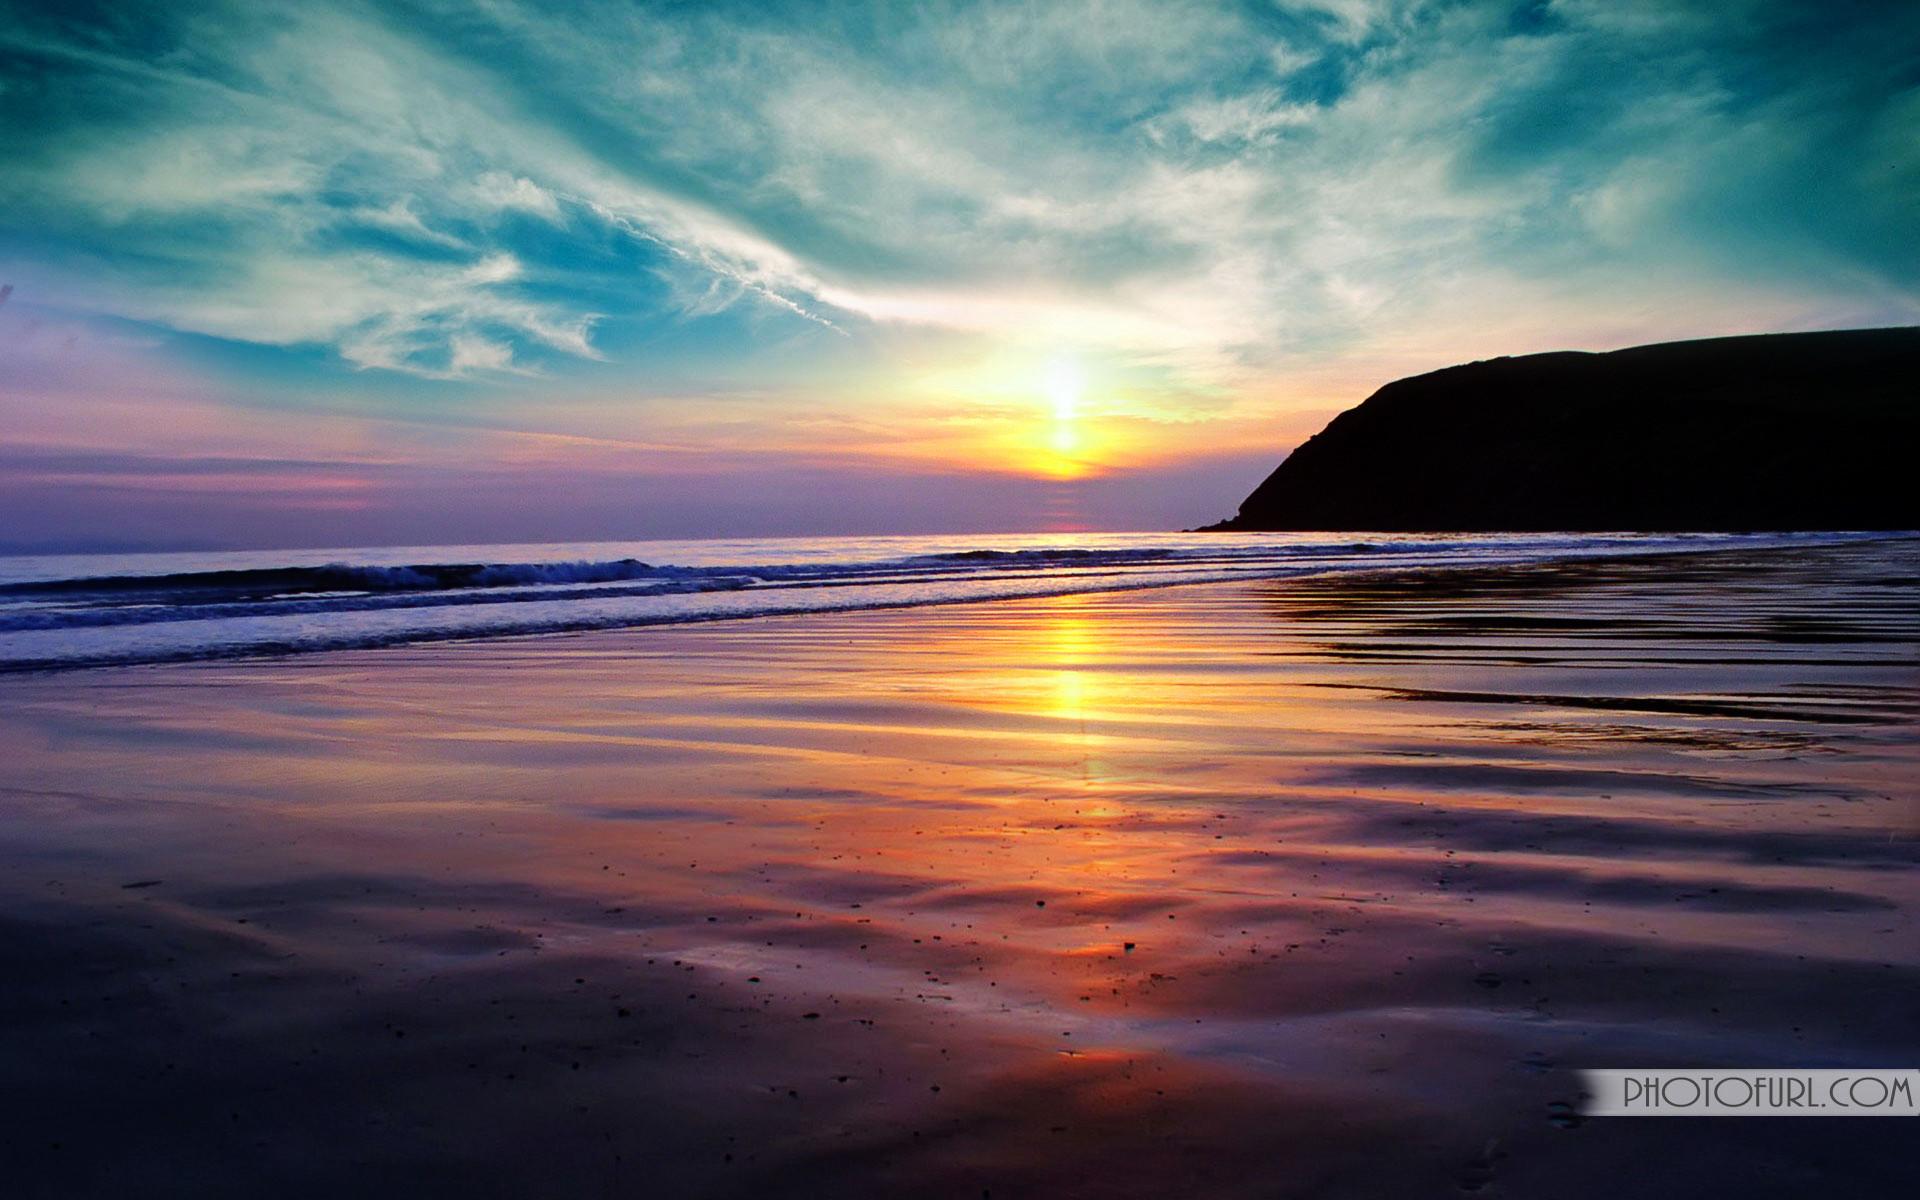 Good morning sunshine nature | HD Wallpapers Rocks | beautiful nature |  Pinterest | Sunshine, Hd wallpaper and Wallpaper